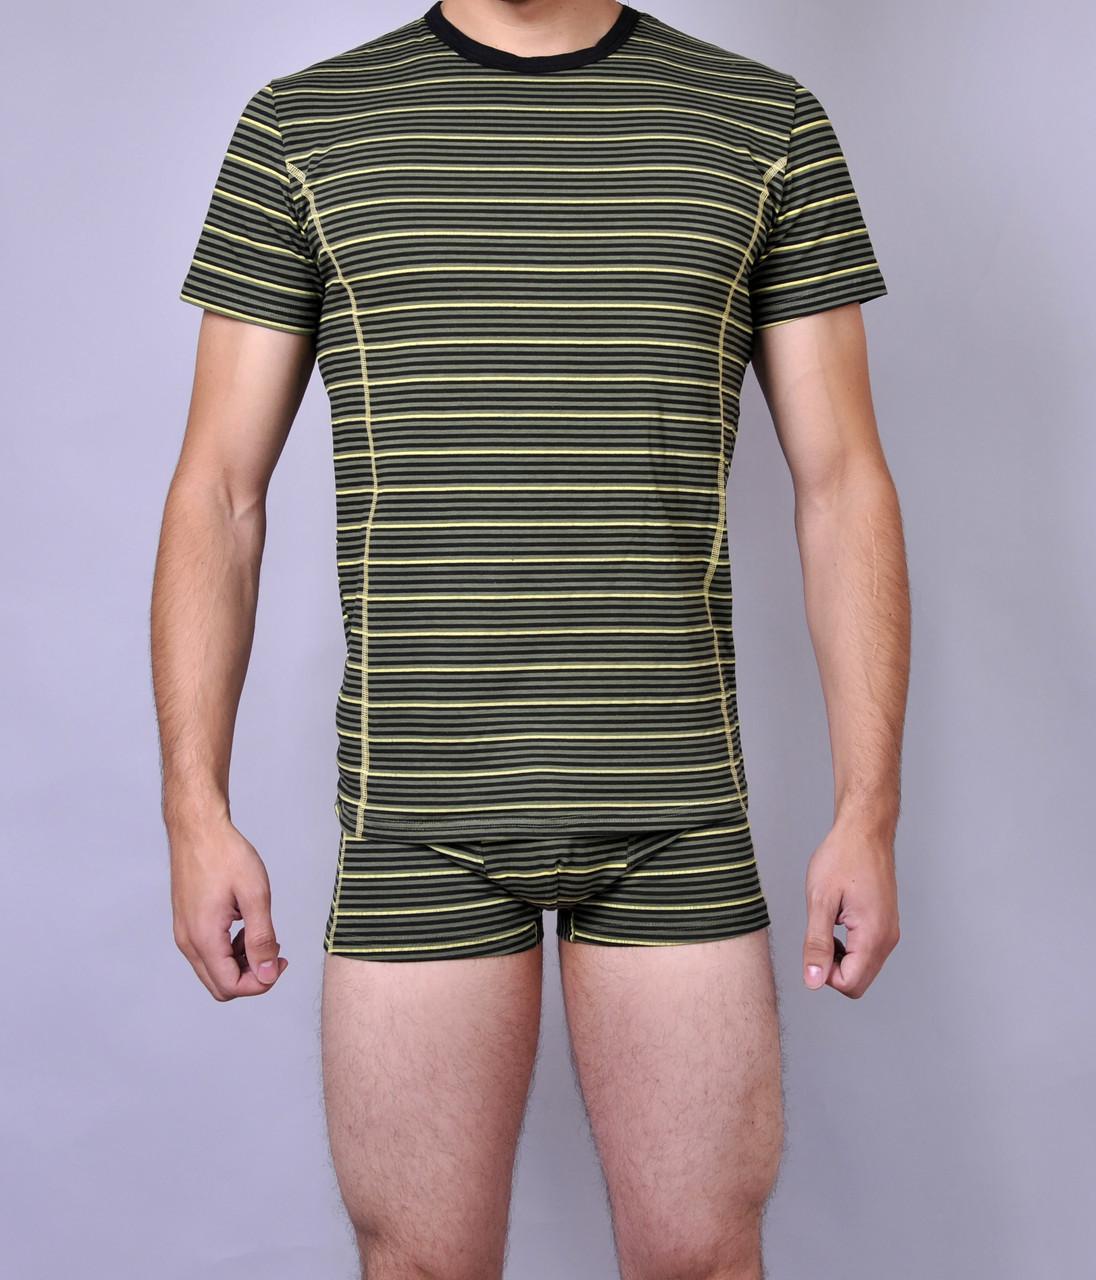 Мужская футболка  C+3 0115 XL Зеленый